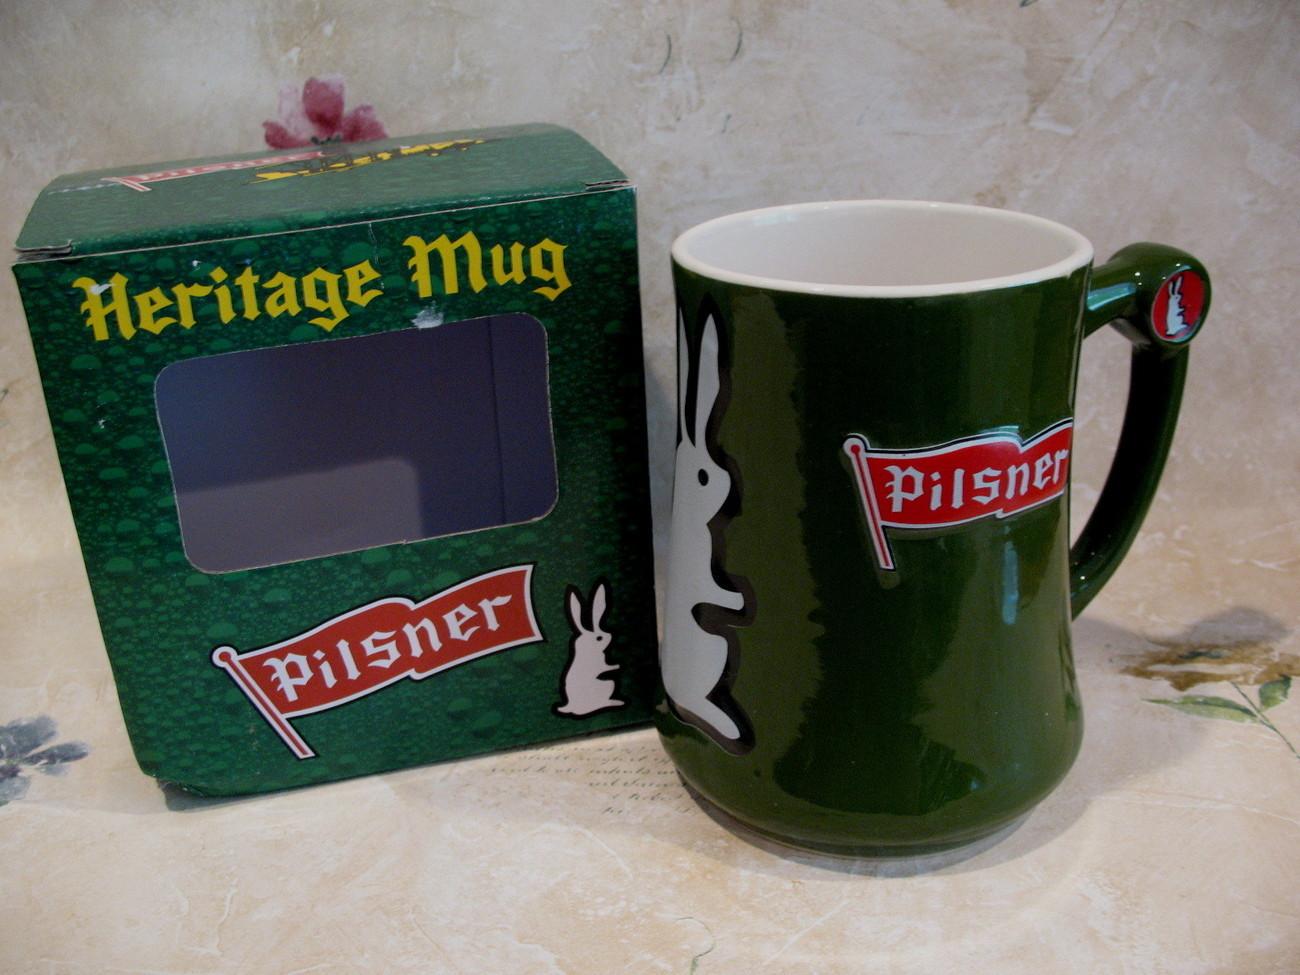 Old Style Pilsner Beer Heritage Glass Mug Souvenir Stein Glasses Cups Mugs